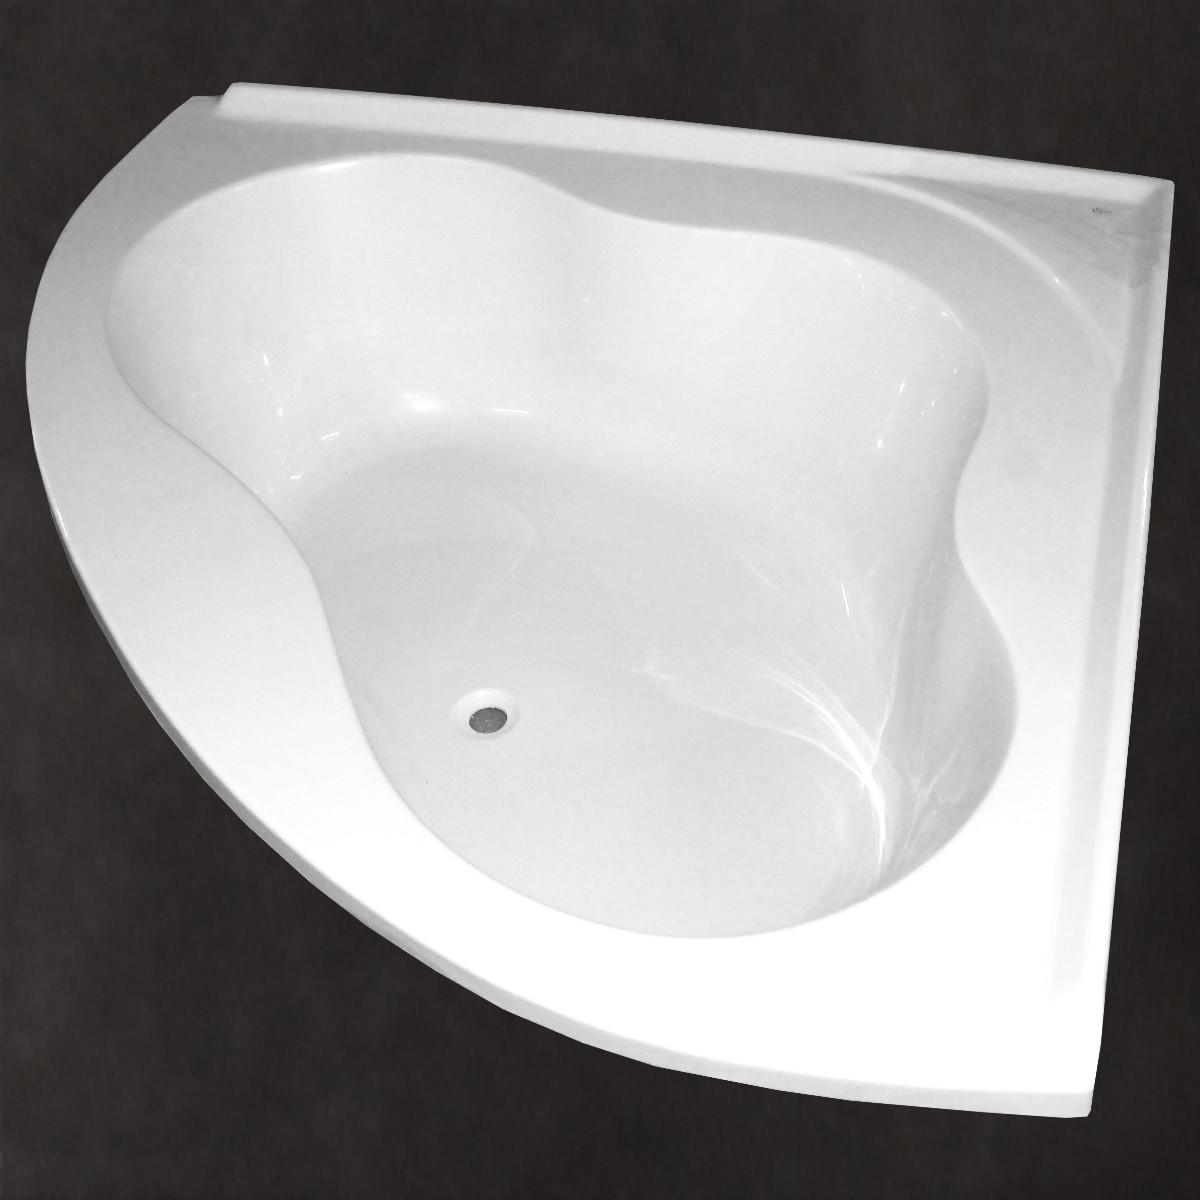 ideal standard cliff duo badewanne eck badewanne 150 x 150. Black Bedroom Furniture Sets. Home Design Ideas